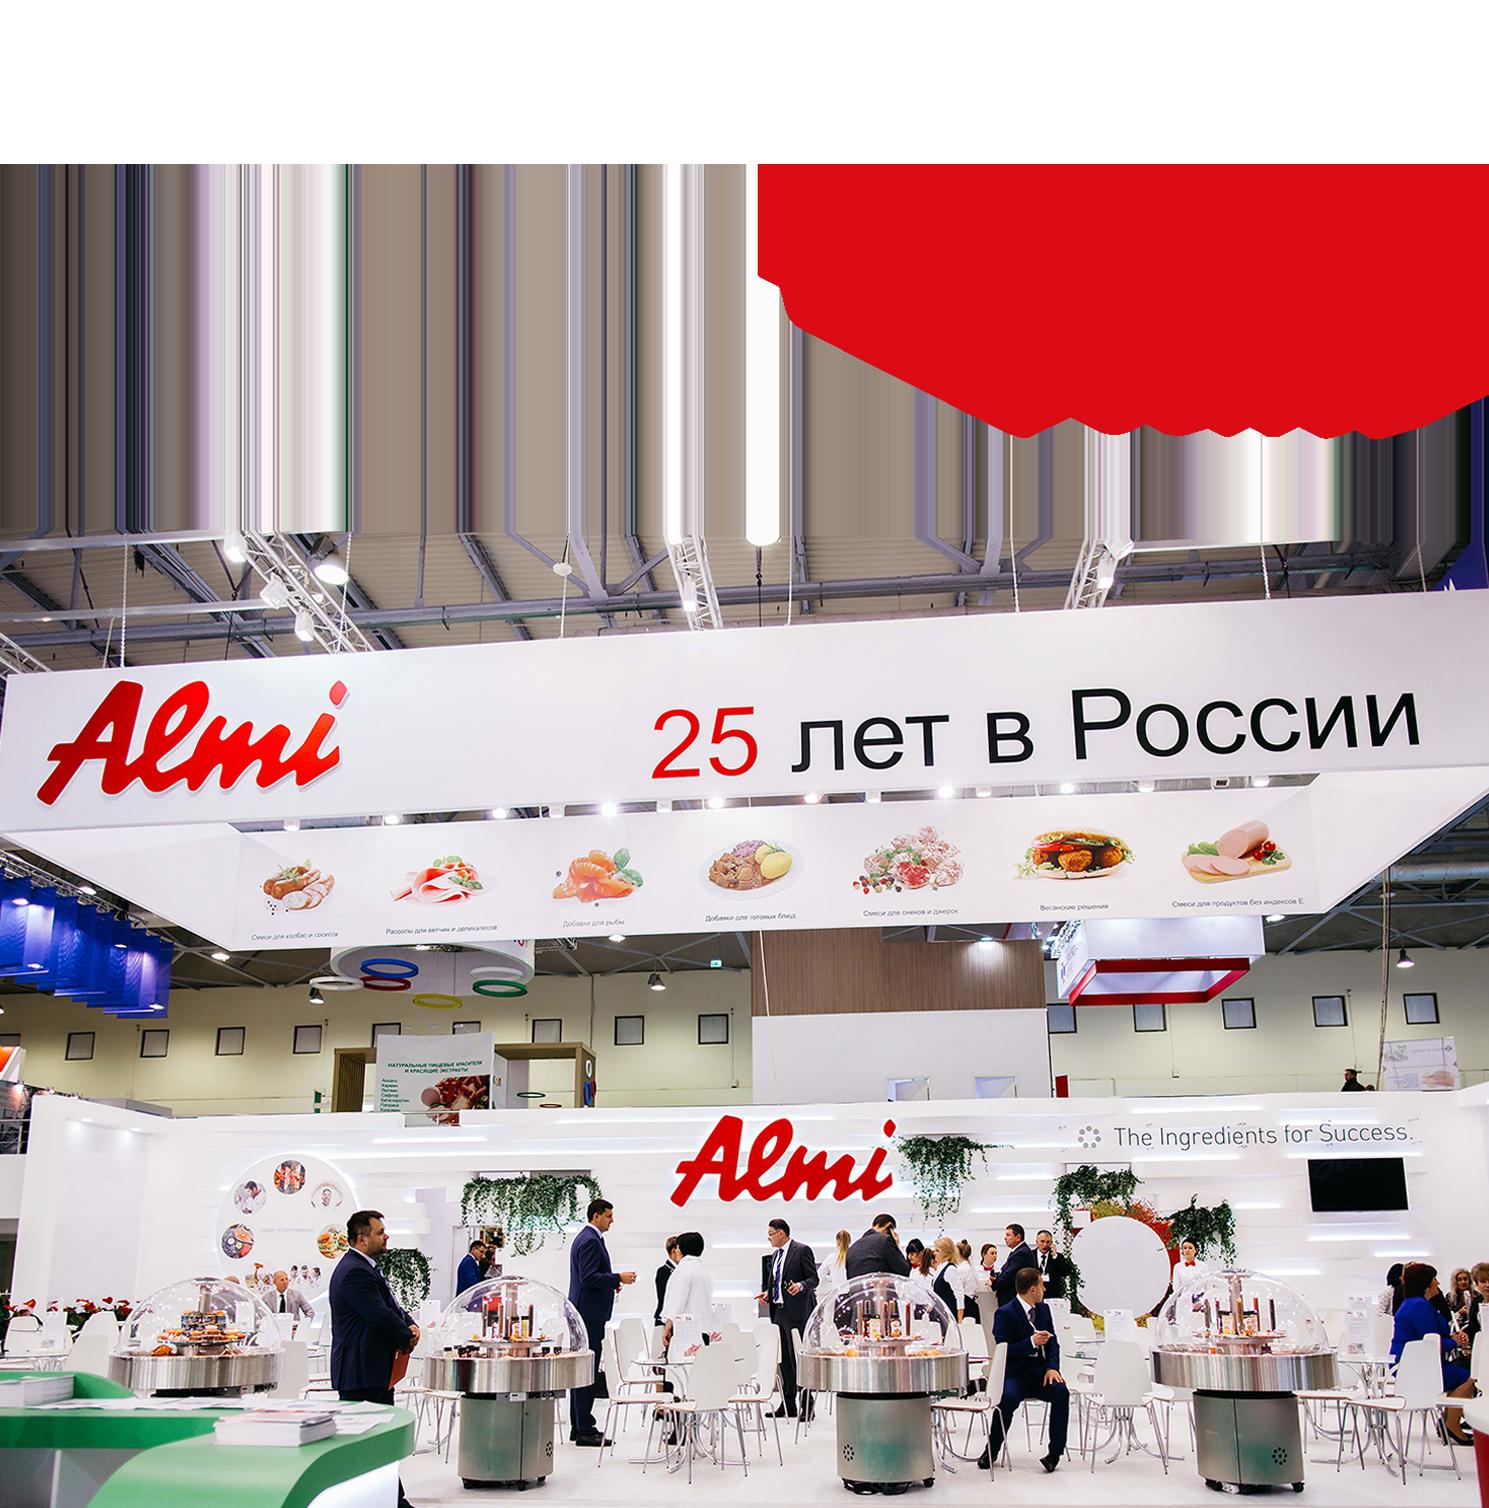 Almi - News - Title